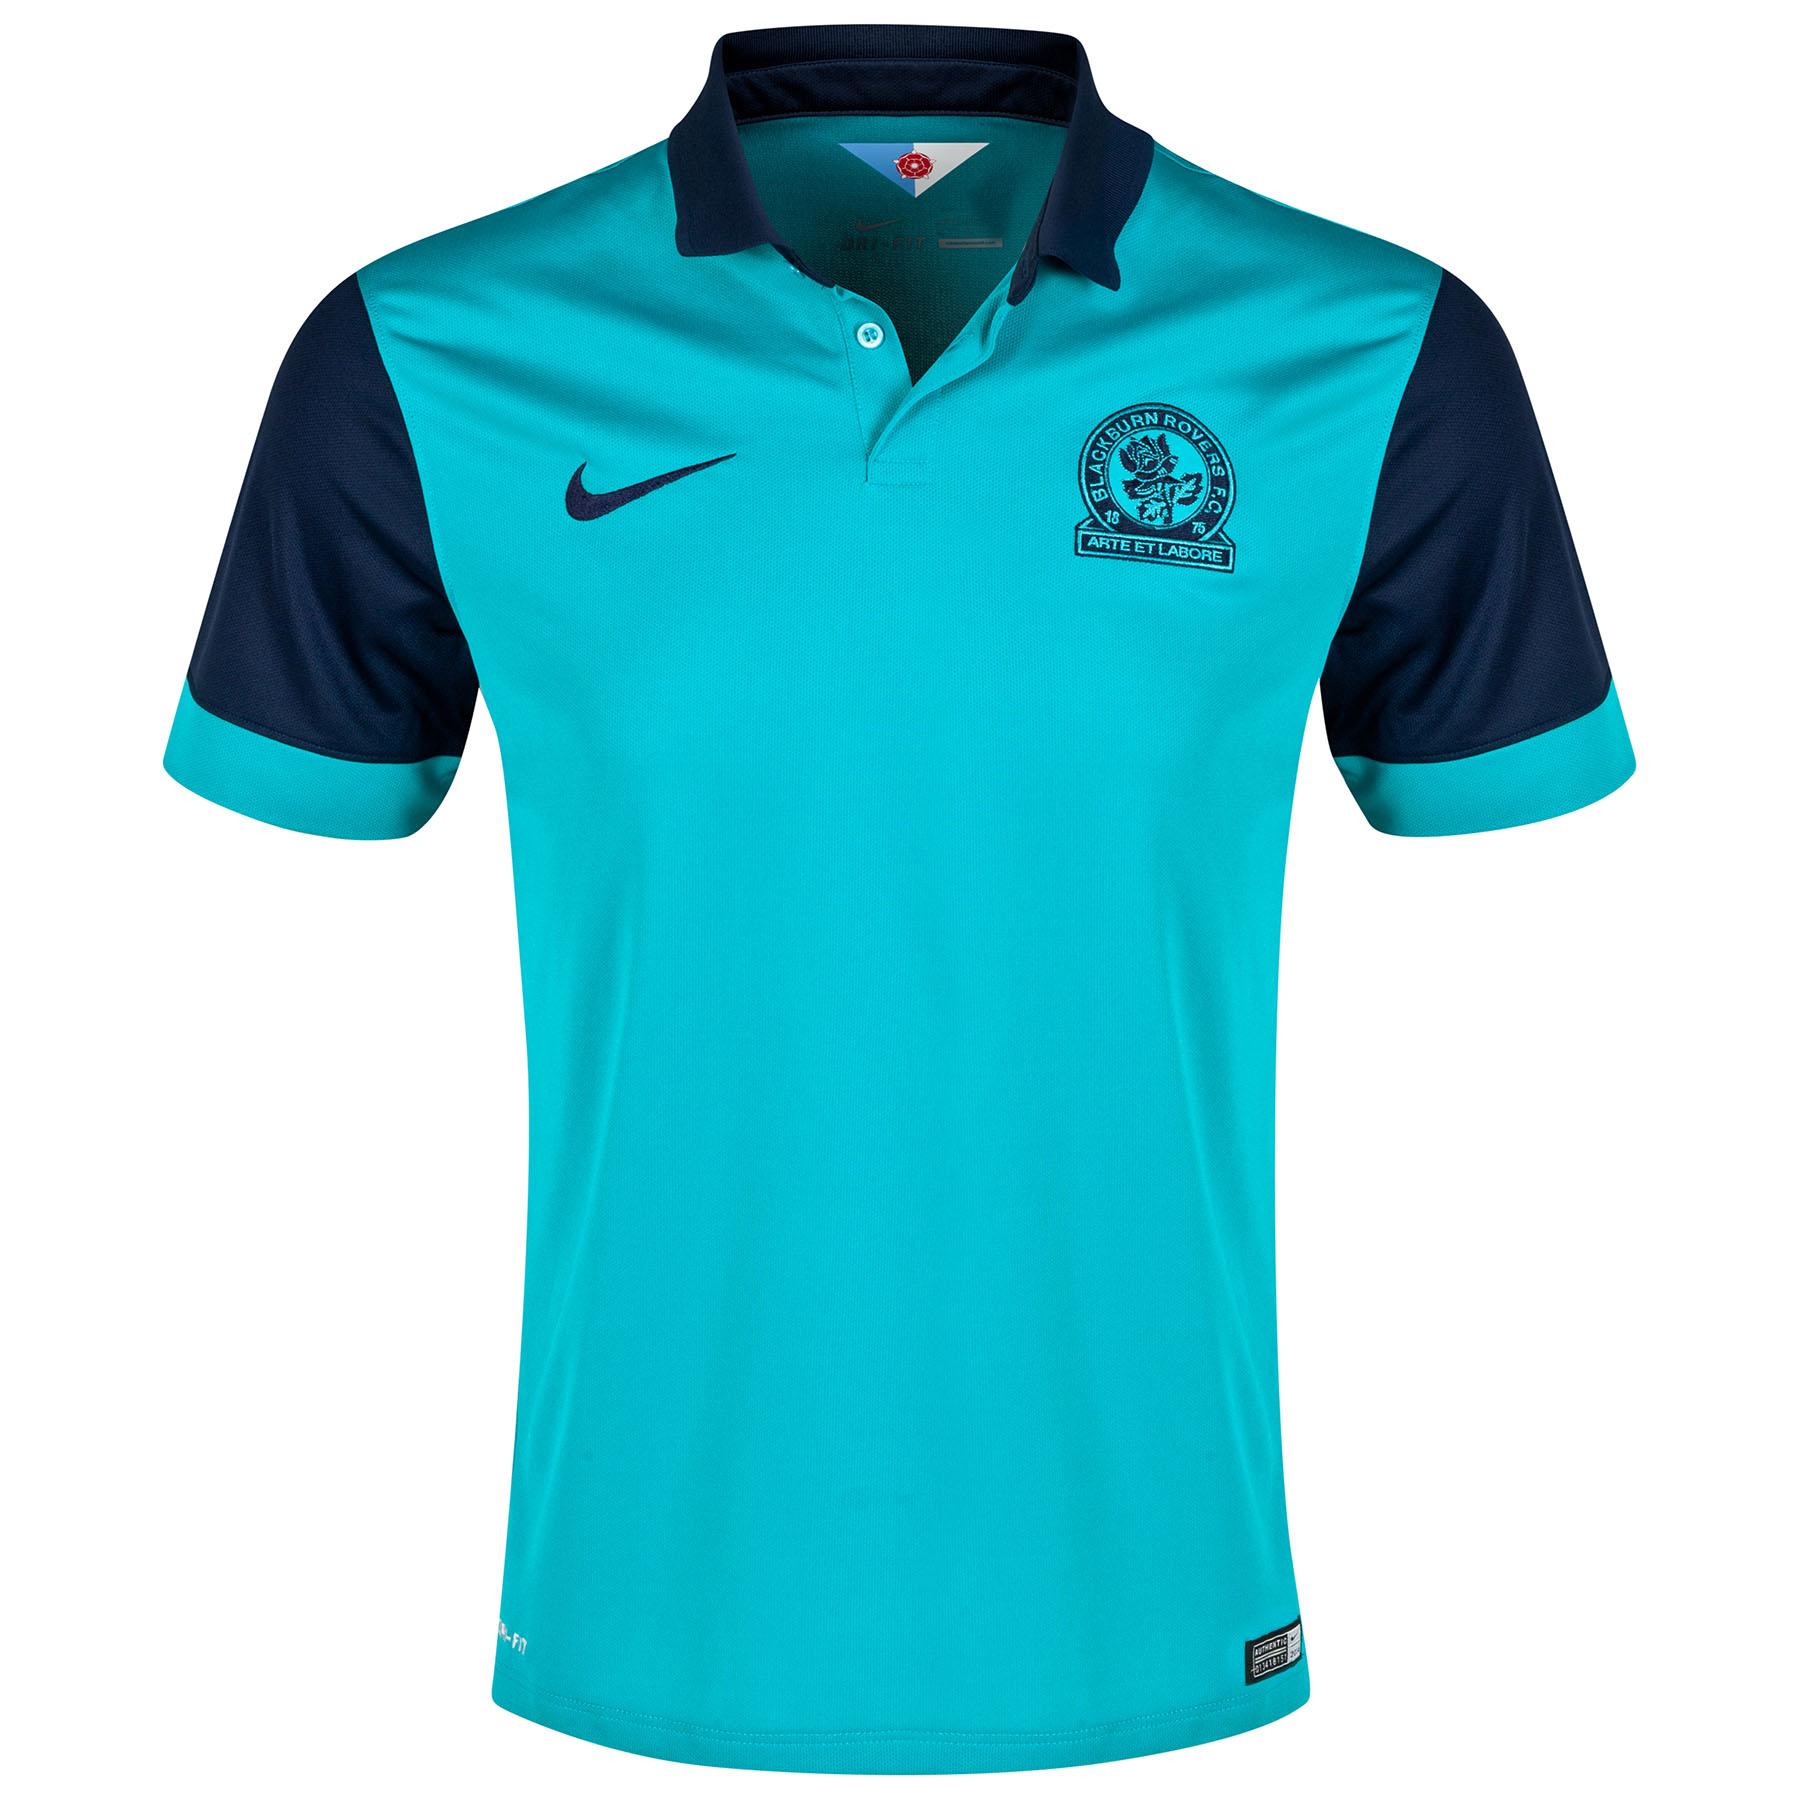 Blackburn Rovers Away Shirt 2014/15 Green